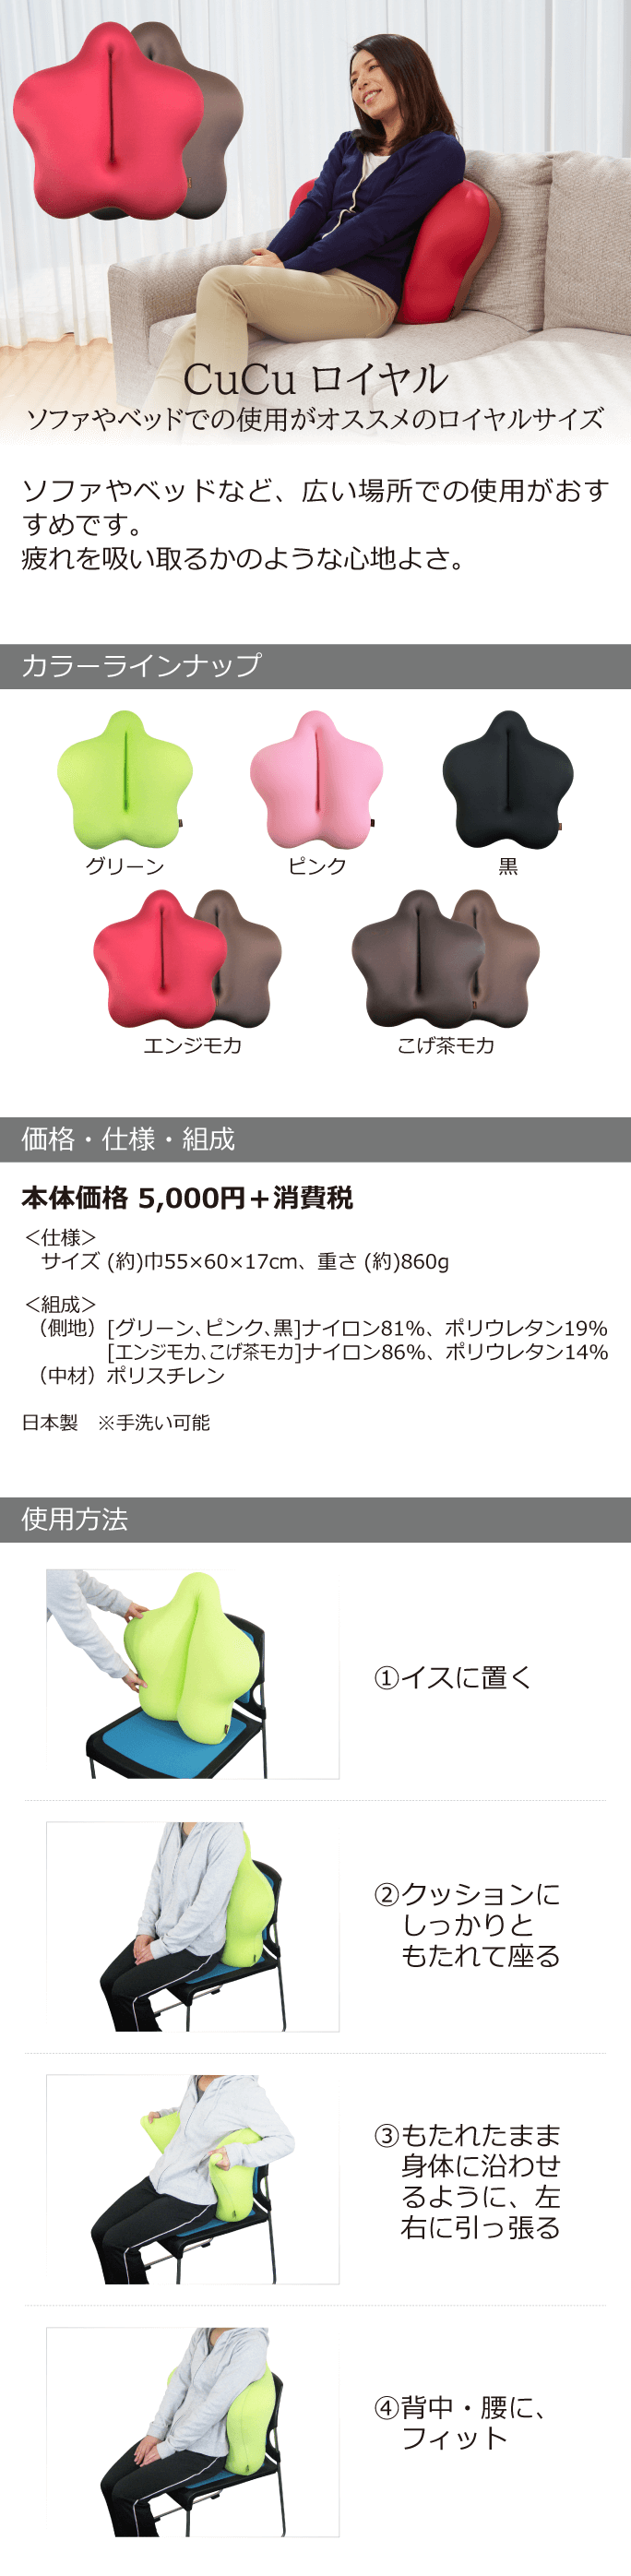 CuCu ロイヤル ソファやベッドでの使用がおすすめのロイヤル ソファやベッドなど、広い場所での使用がおすすめです。疲れを吸いとるかのような心地よさ。 カラーラインナップ グリーン ピンク 黒 エンジモカ こげ茶モカ  価格・仕様・組成 本体価格5,000円+消費税 <仕様>サイズ(約)幅55×60×17cm、重さ(約)860g <組成>(側地)[グリーン、ピンク、黒]ナイロン81%、ポリウレタン19% [エンジモカ、こげ茶モカ]ナイロン86%、ポリウレタン14% (中材)ポリスチレン 日本製 ※手洗い可能 使用方法 1イスに置く 2クッションにしっかりともたれて座る 3もたれたまま身体に沿わせるように、左右に引っ張る 4背中・腰にフィット!